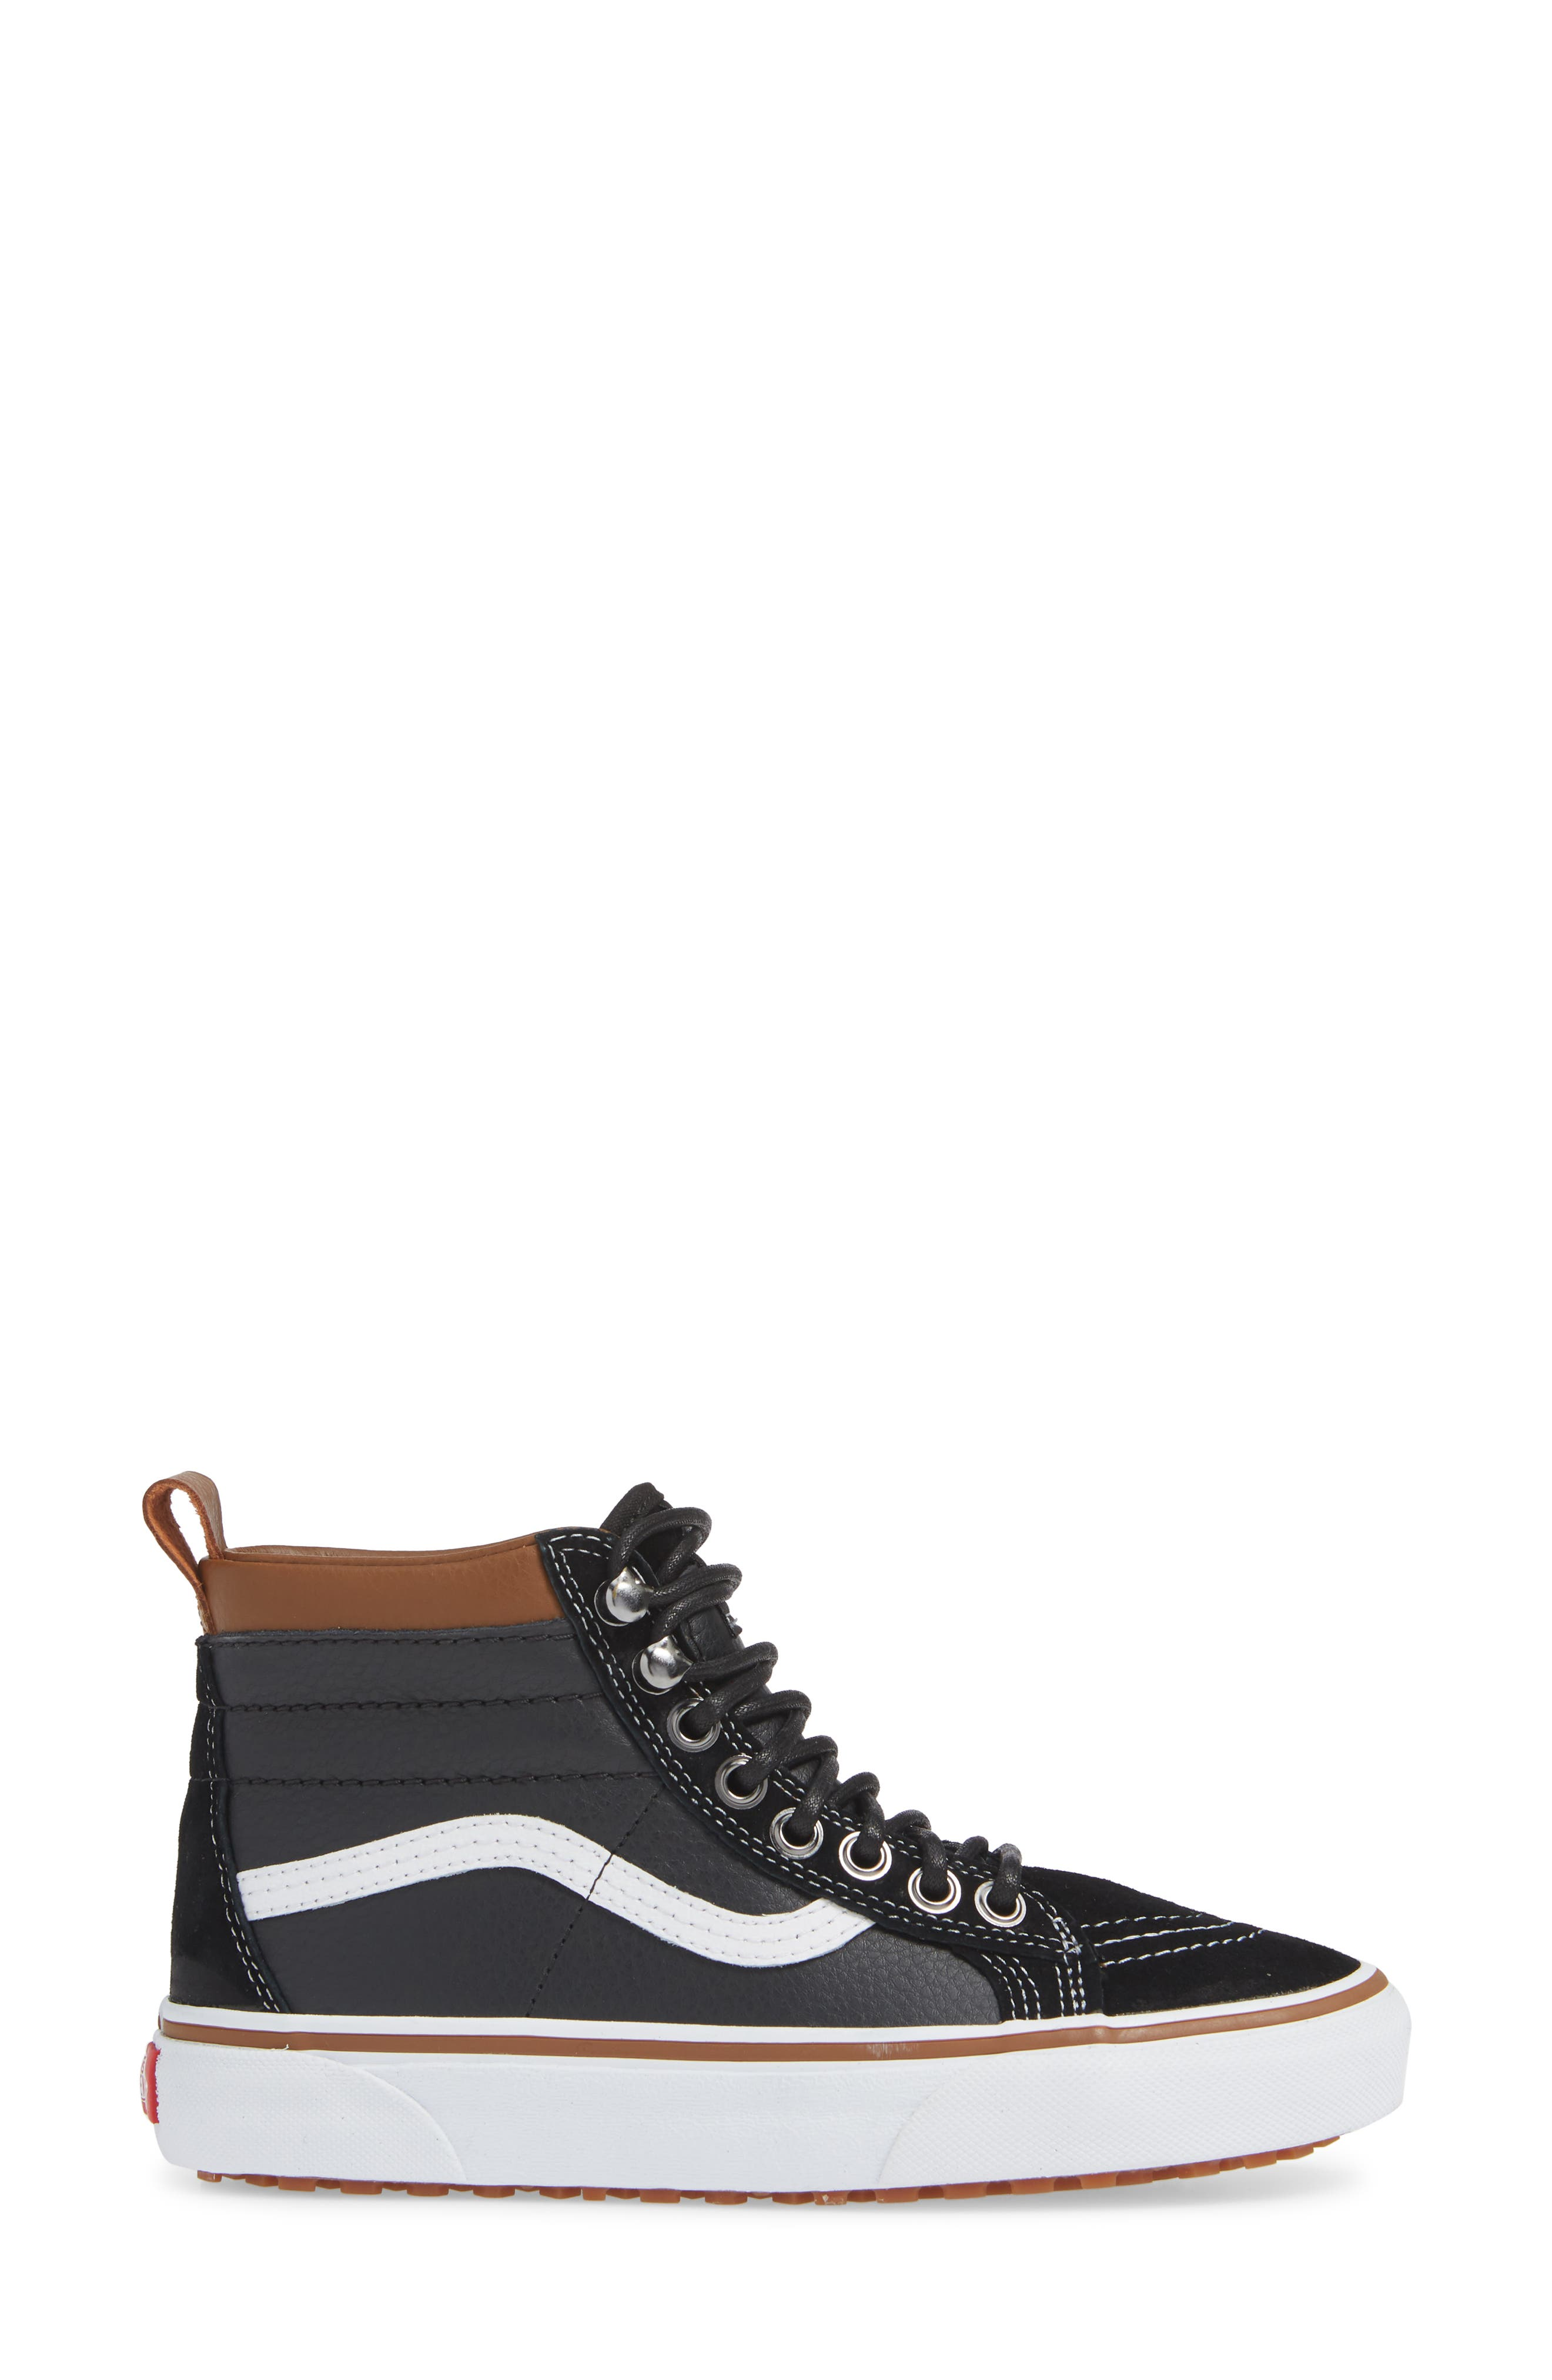 Sk-8 Hi MTE Sneaker,                             Alternate thumbnail 3, color,                             LEATHER/ BLACK/ TRUE WHITE